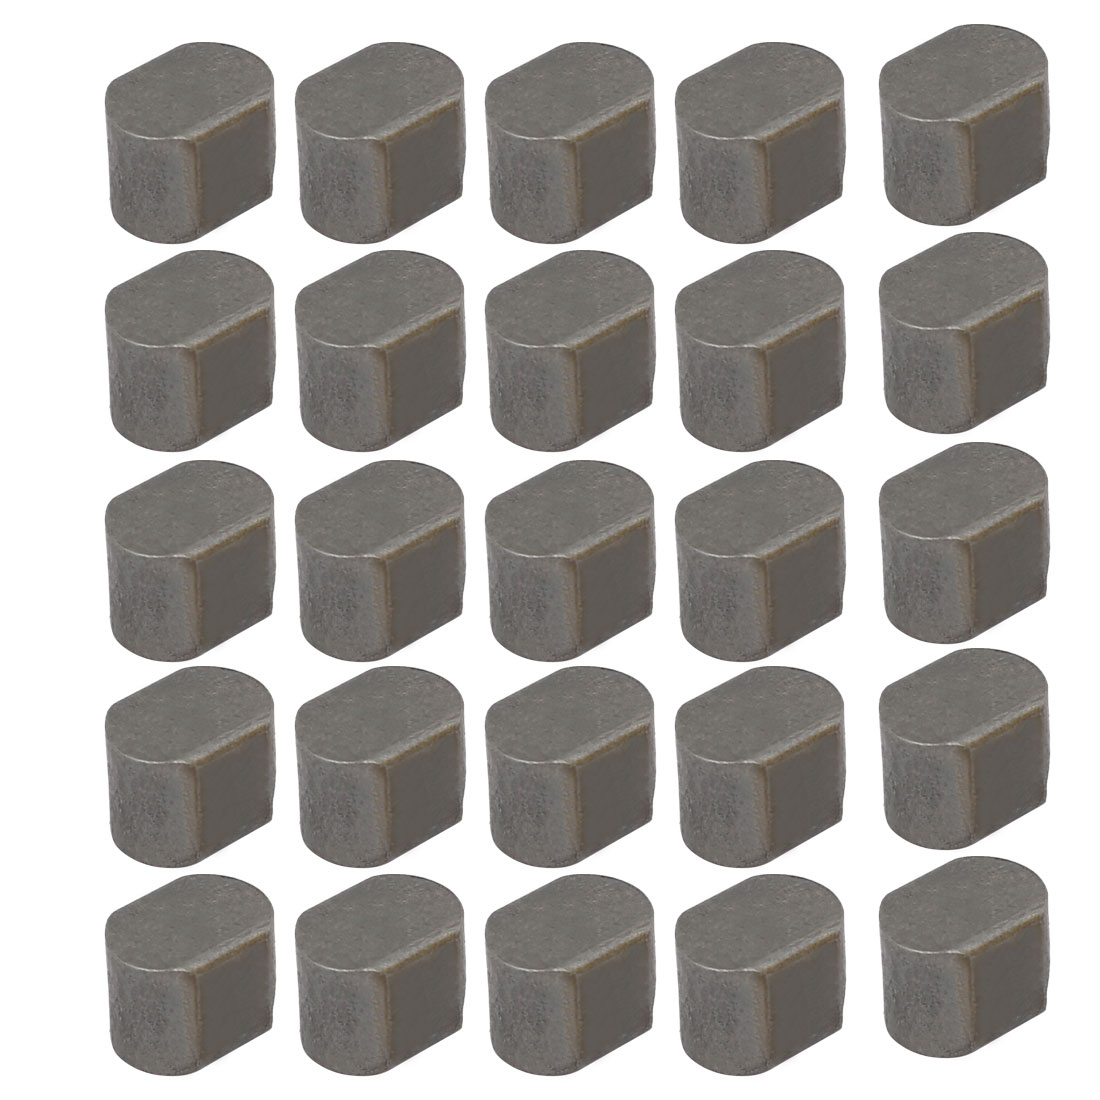 8mmx6mmx6mm Carbon Steel Key Stock To Lock Pulleys 25pcs